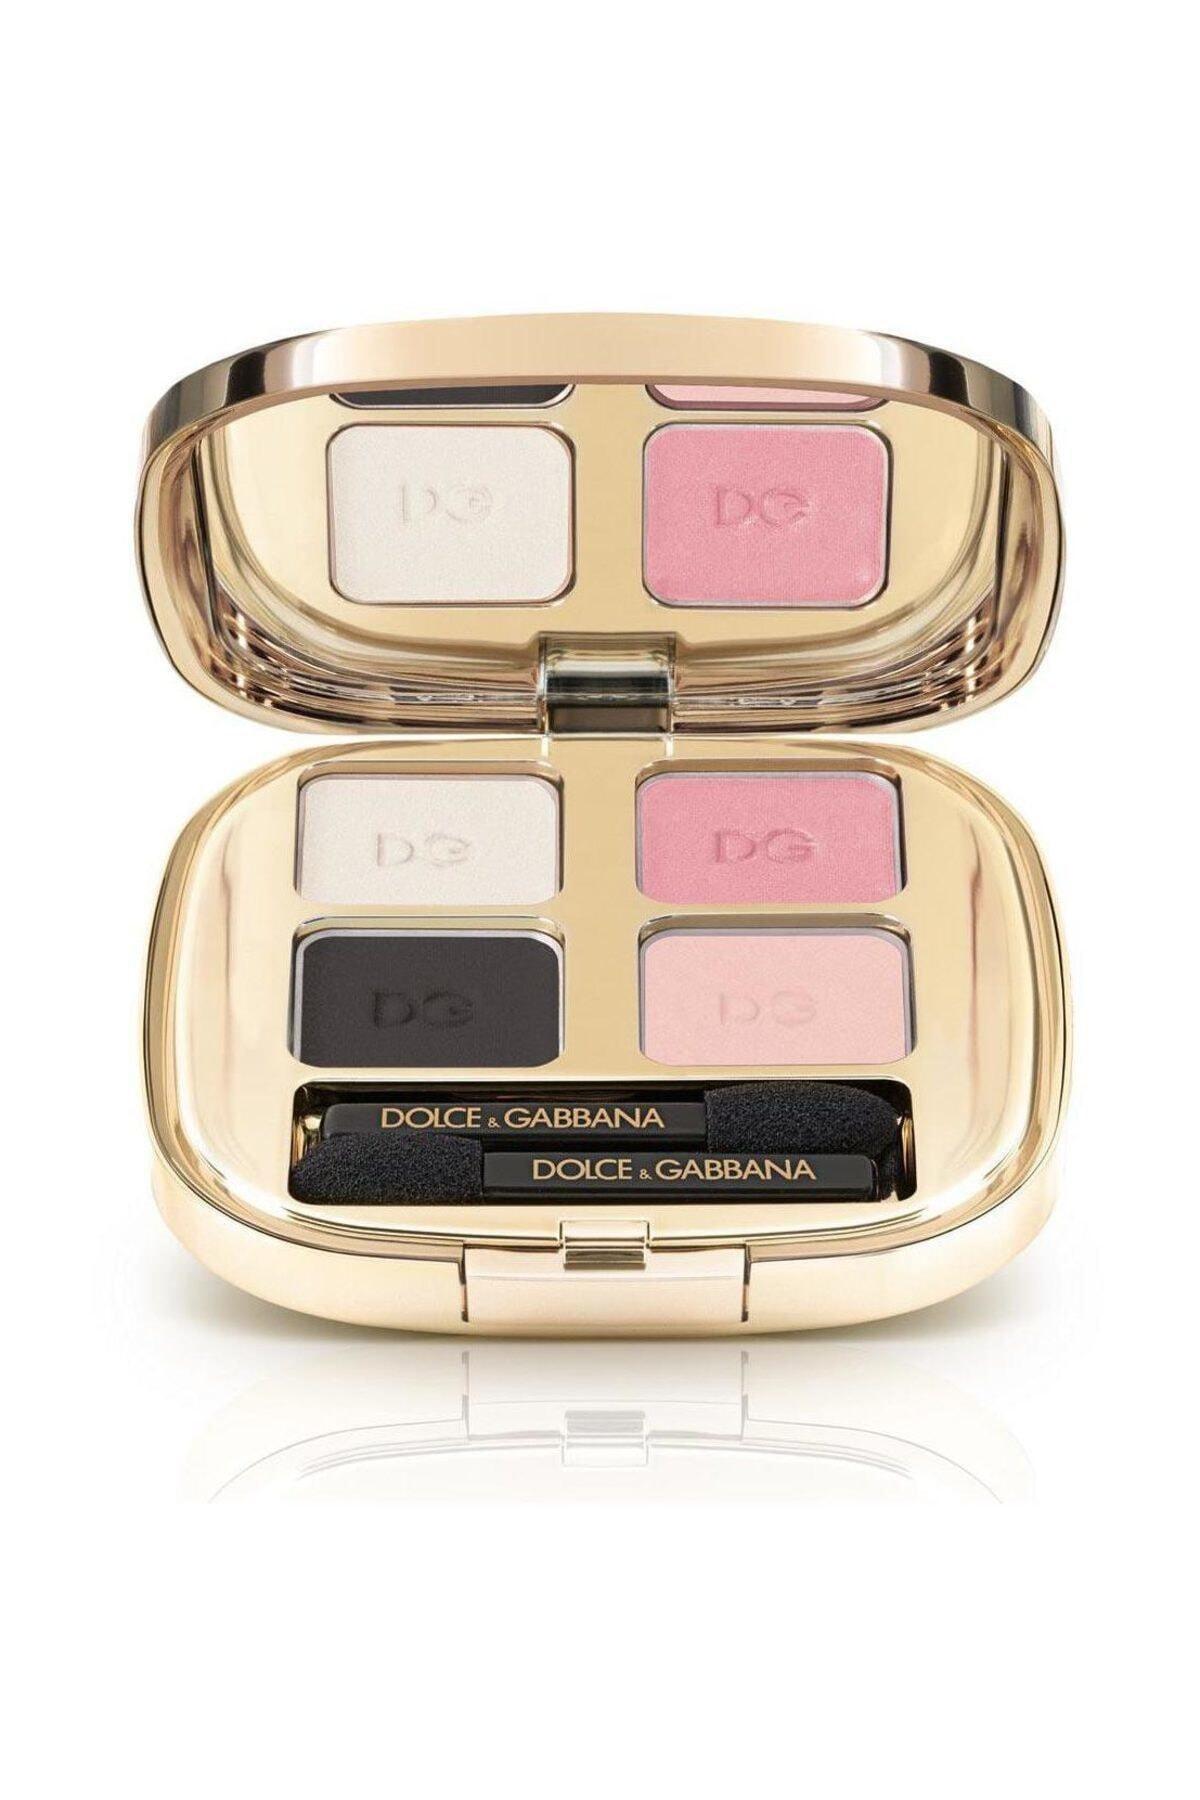 Dolce Gabbana Smooth Eye Colour Quad Göz Farı 143 Miss Dolce 730870203101 1